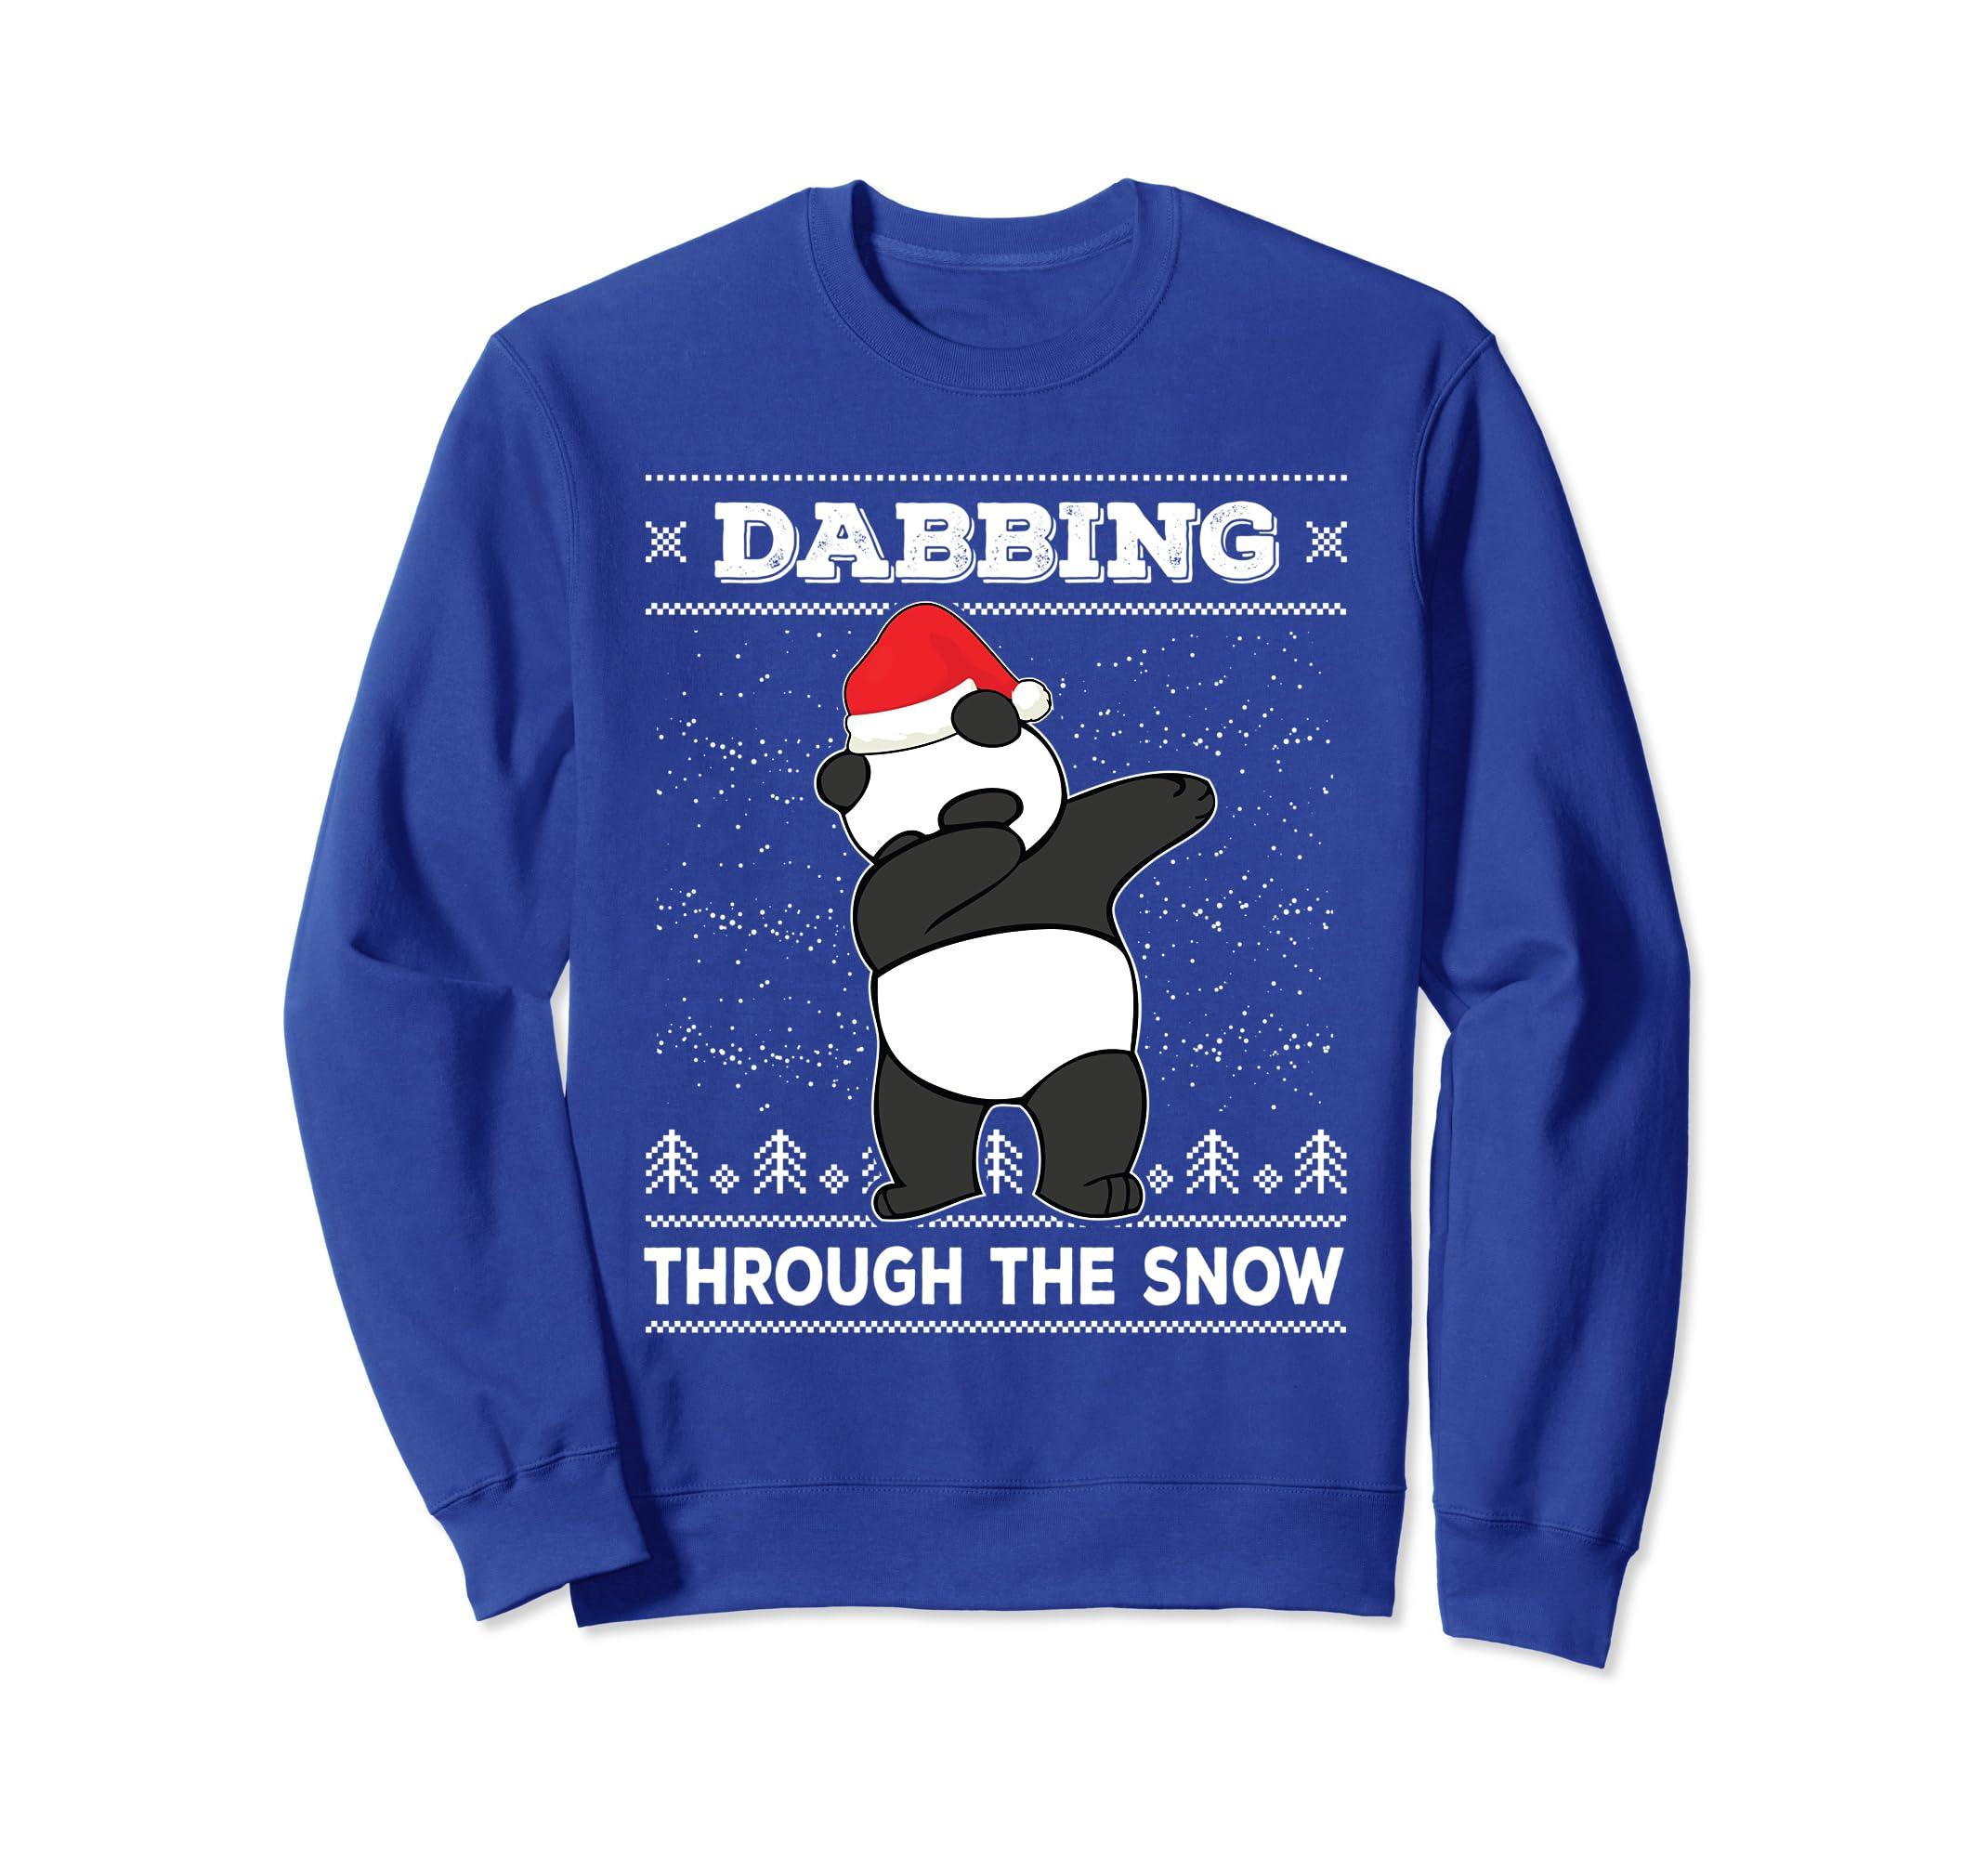 76e673a9d58fa Amazon.com  Dabbing Panda Ugly Christmas Sweater Dab Dance Sweatshirt   Clothing